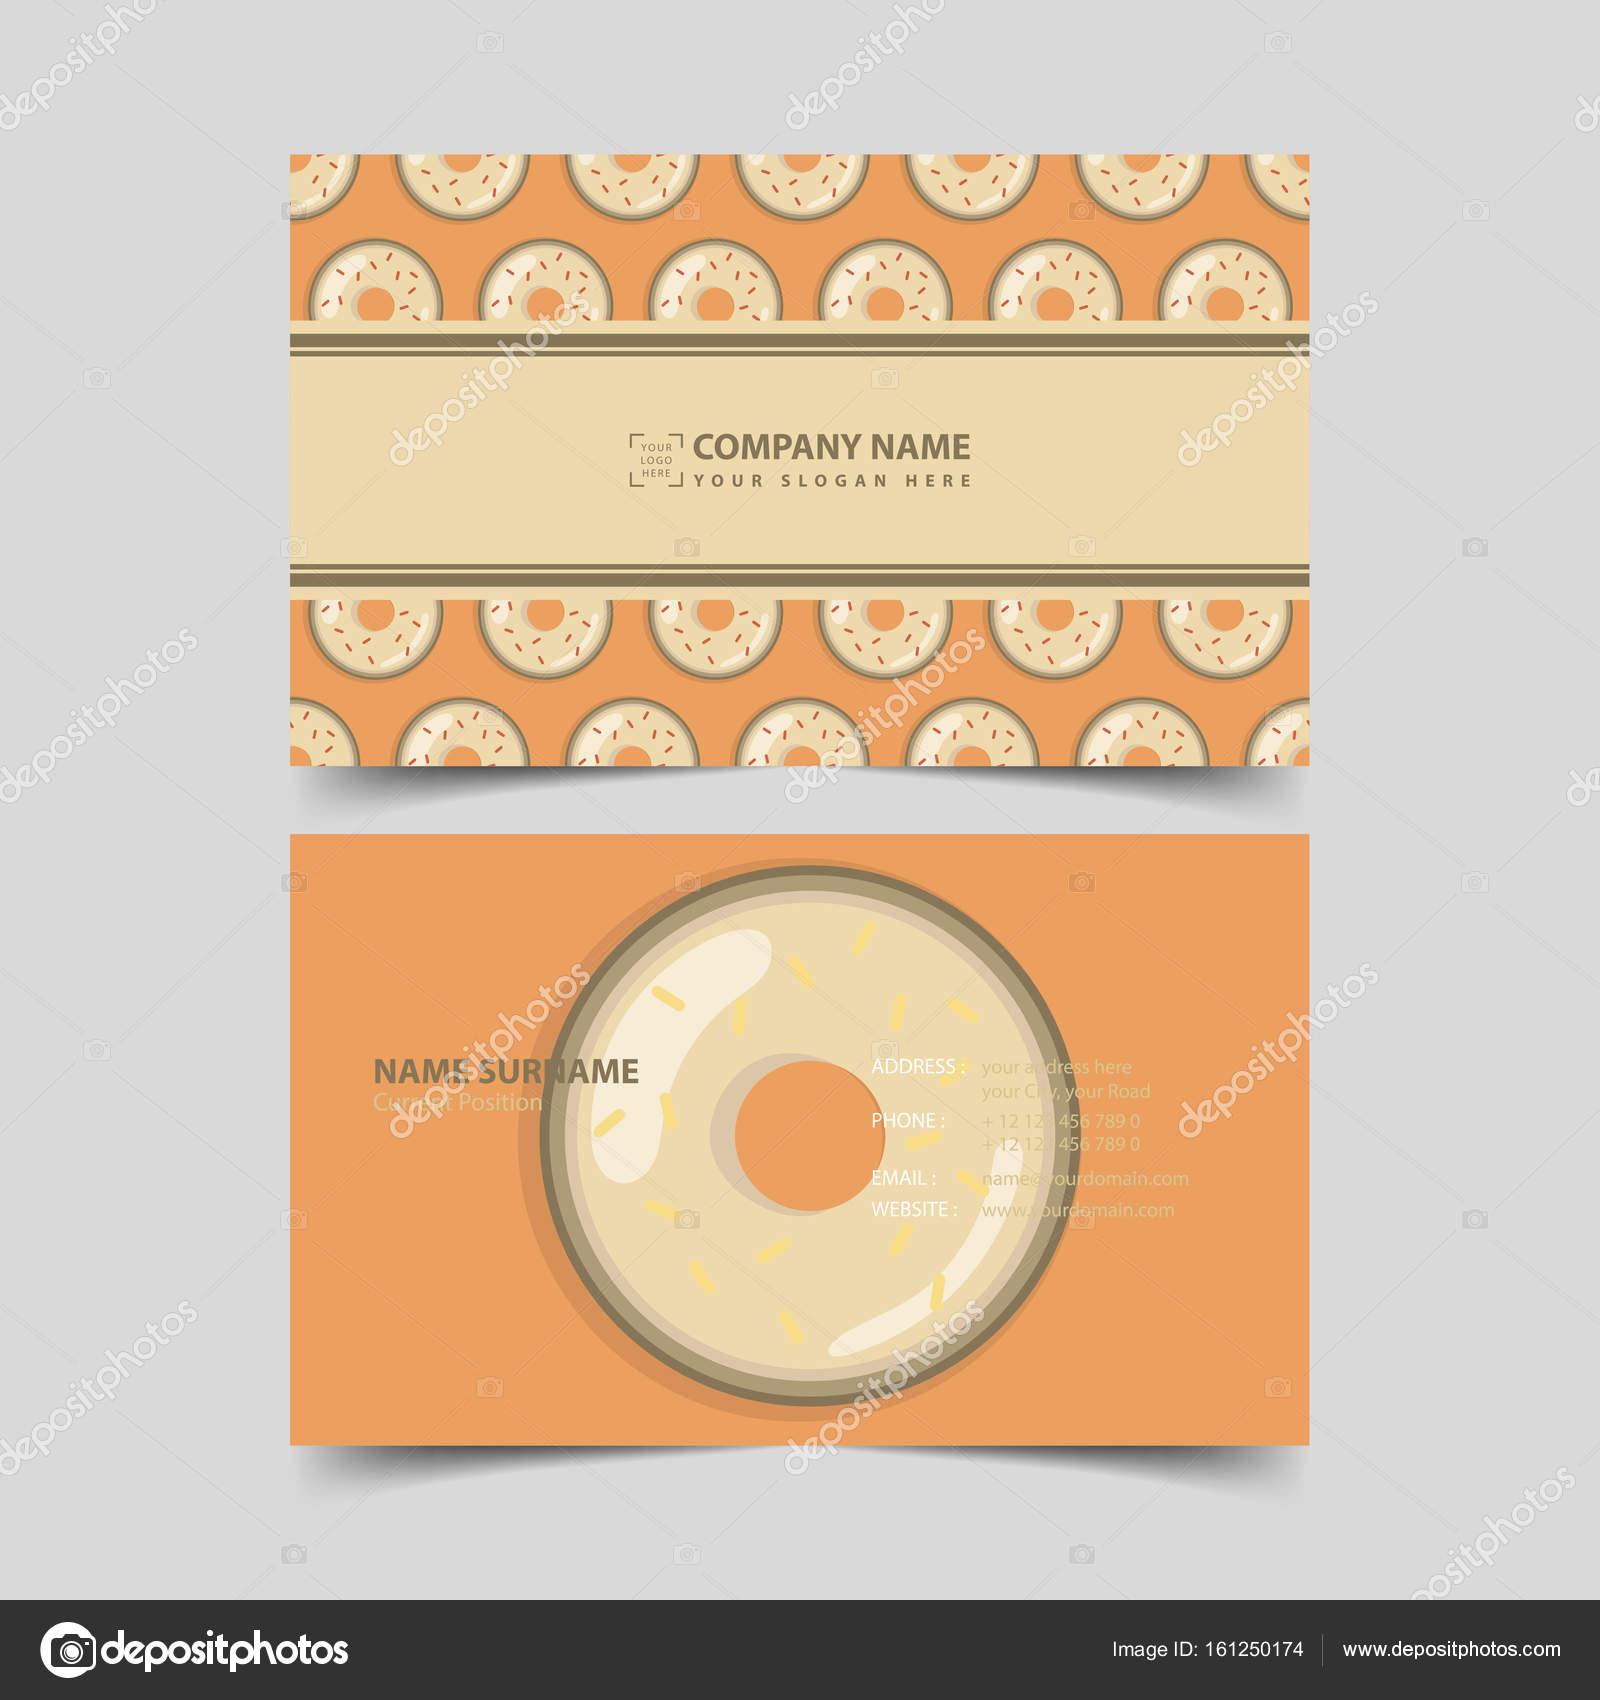 Pastry chef business card design template stock vector pastry chef business card design template stock vector colourmoves